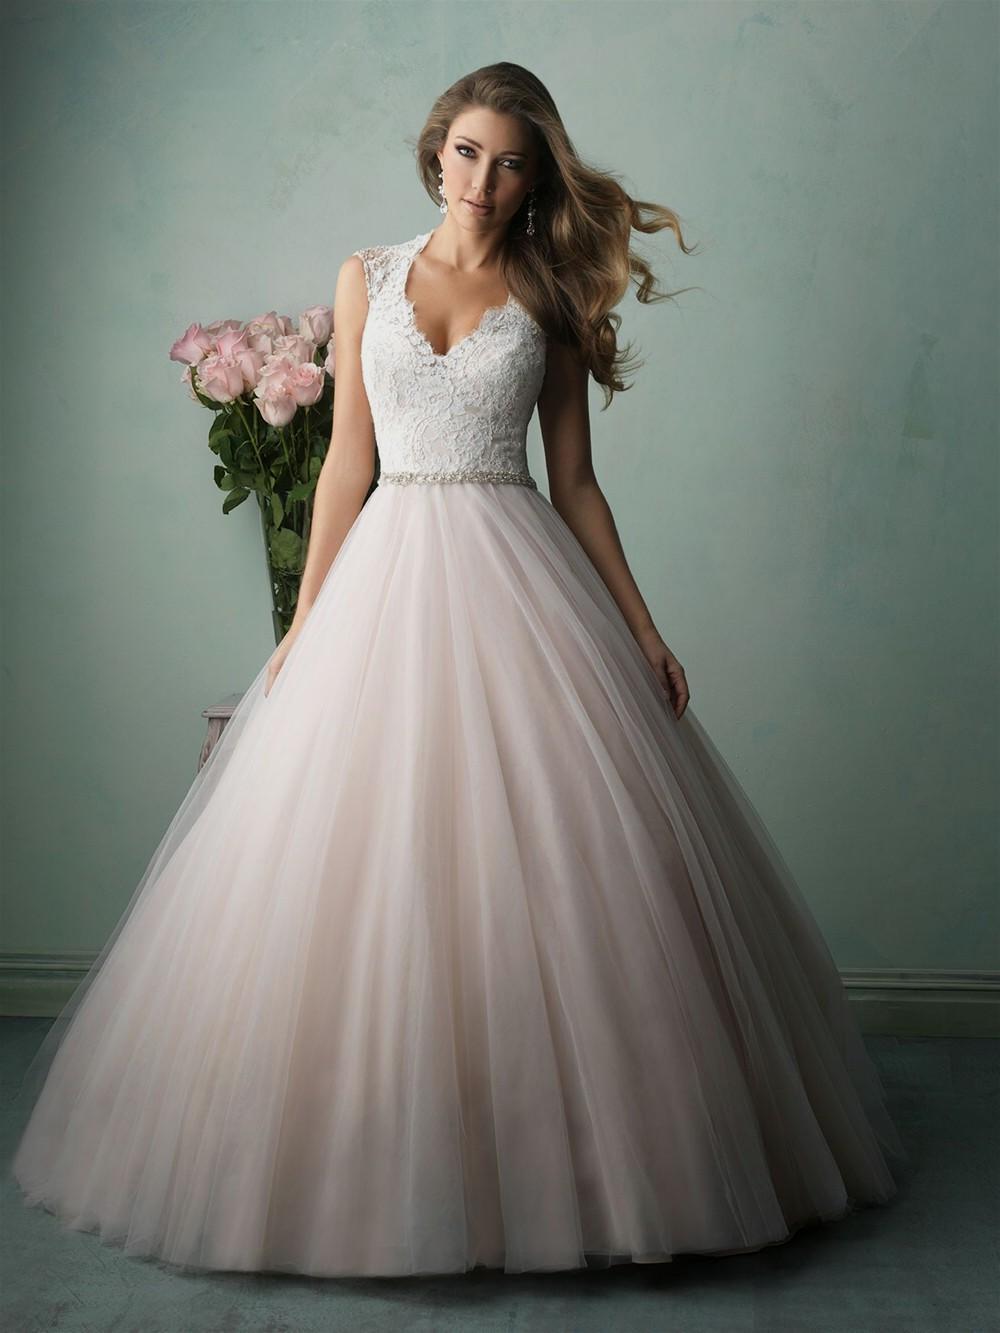 allure wedding dresses prices photo - 1